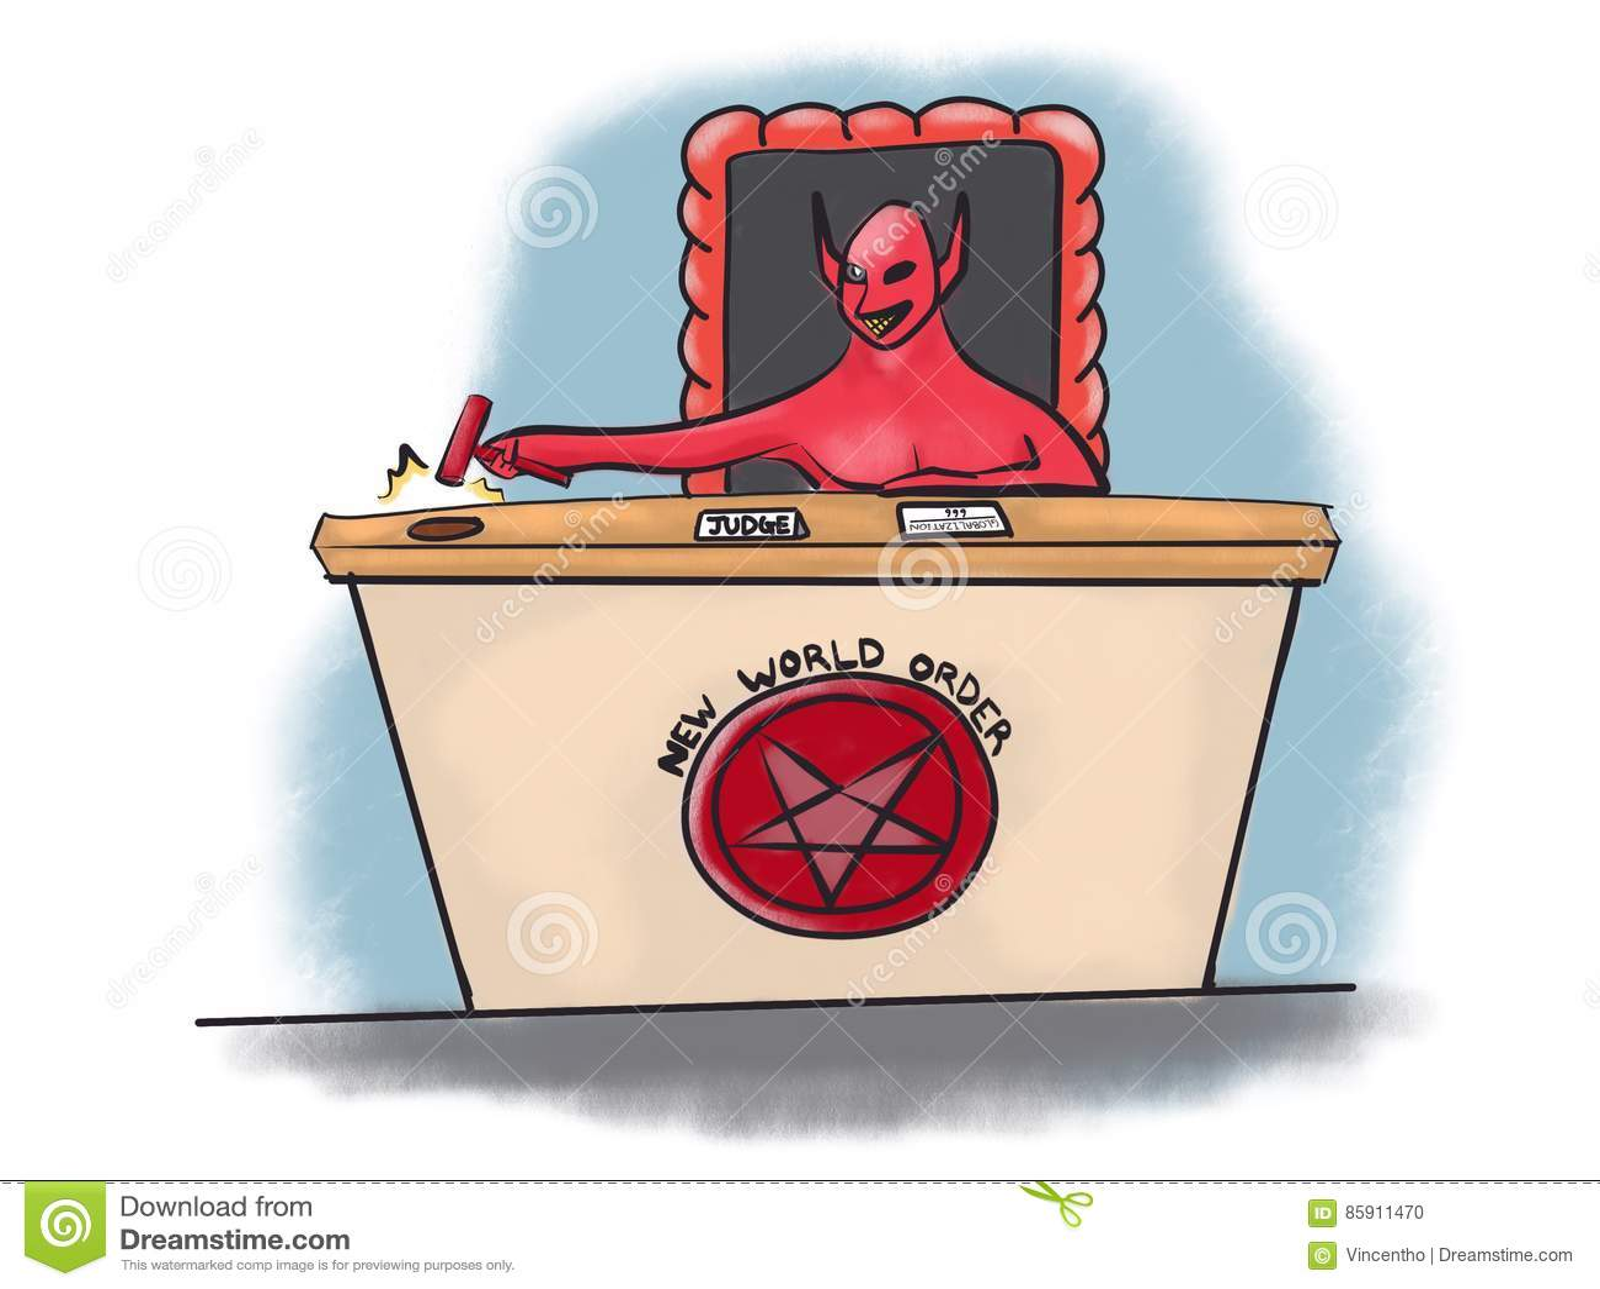 Juiz novo Globalization Cartoon Illustration do diabo do ordem mundial